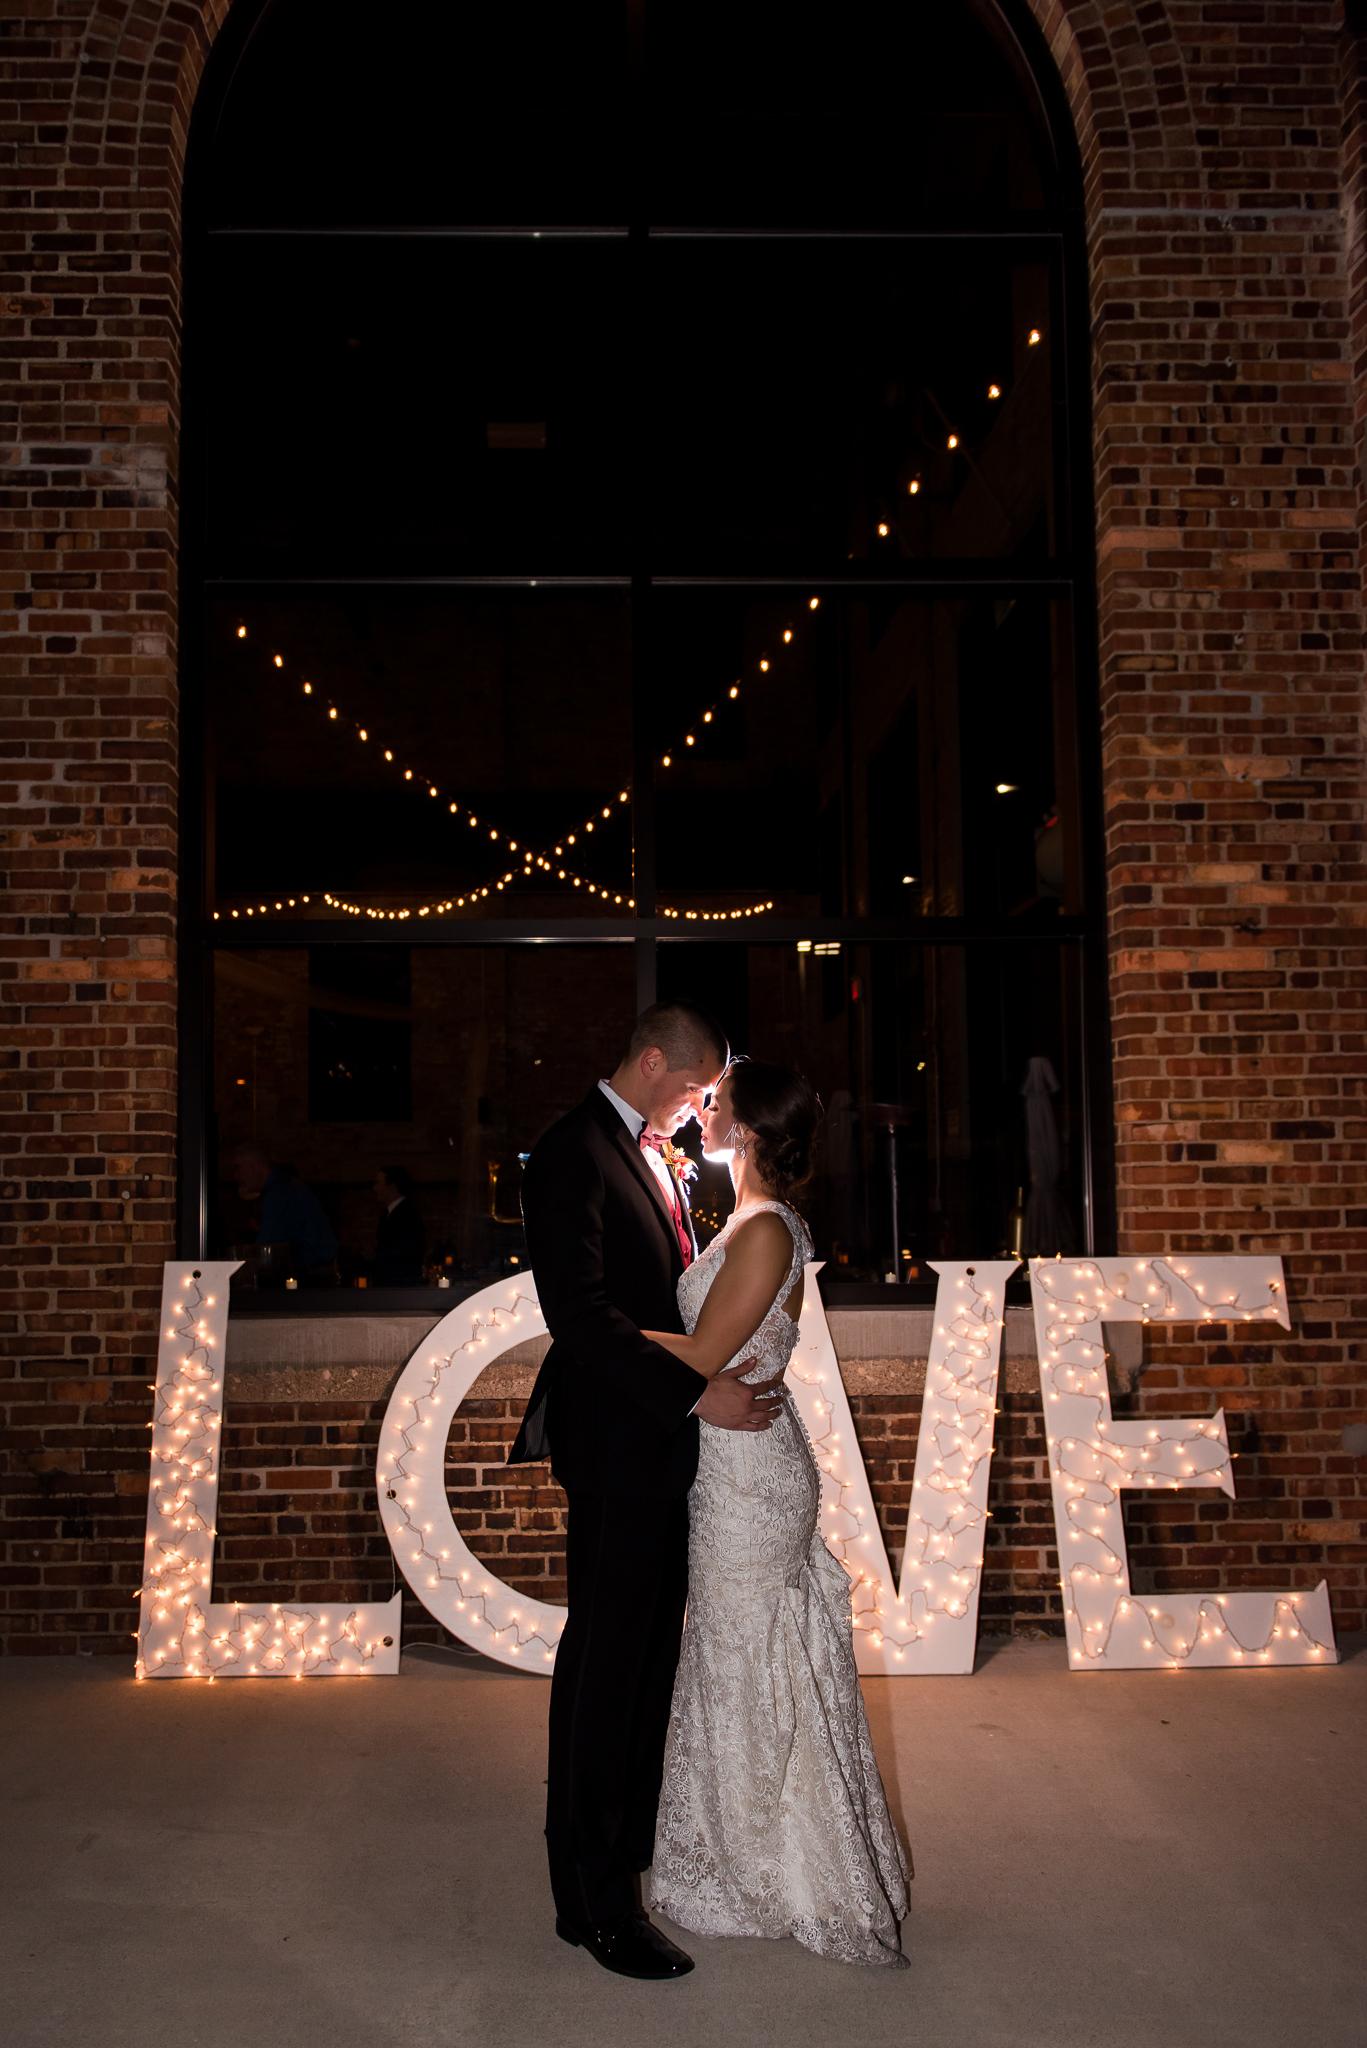 The-Millbottom-Jefferson-City-Missouri-Wedding-Details-Gold-and-Marsala-Wedding-Capitol-Bride-and-Groom-Portraits